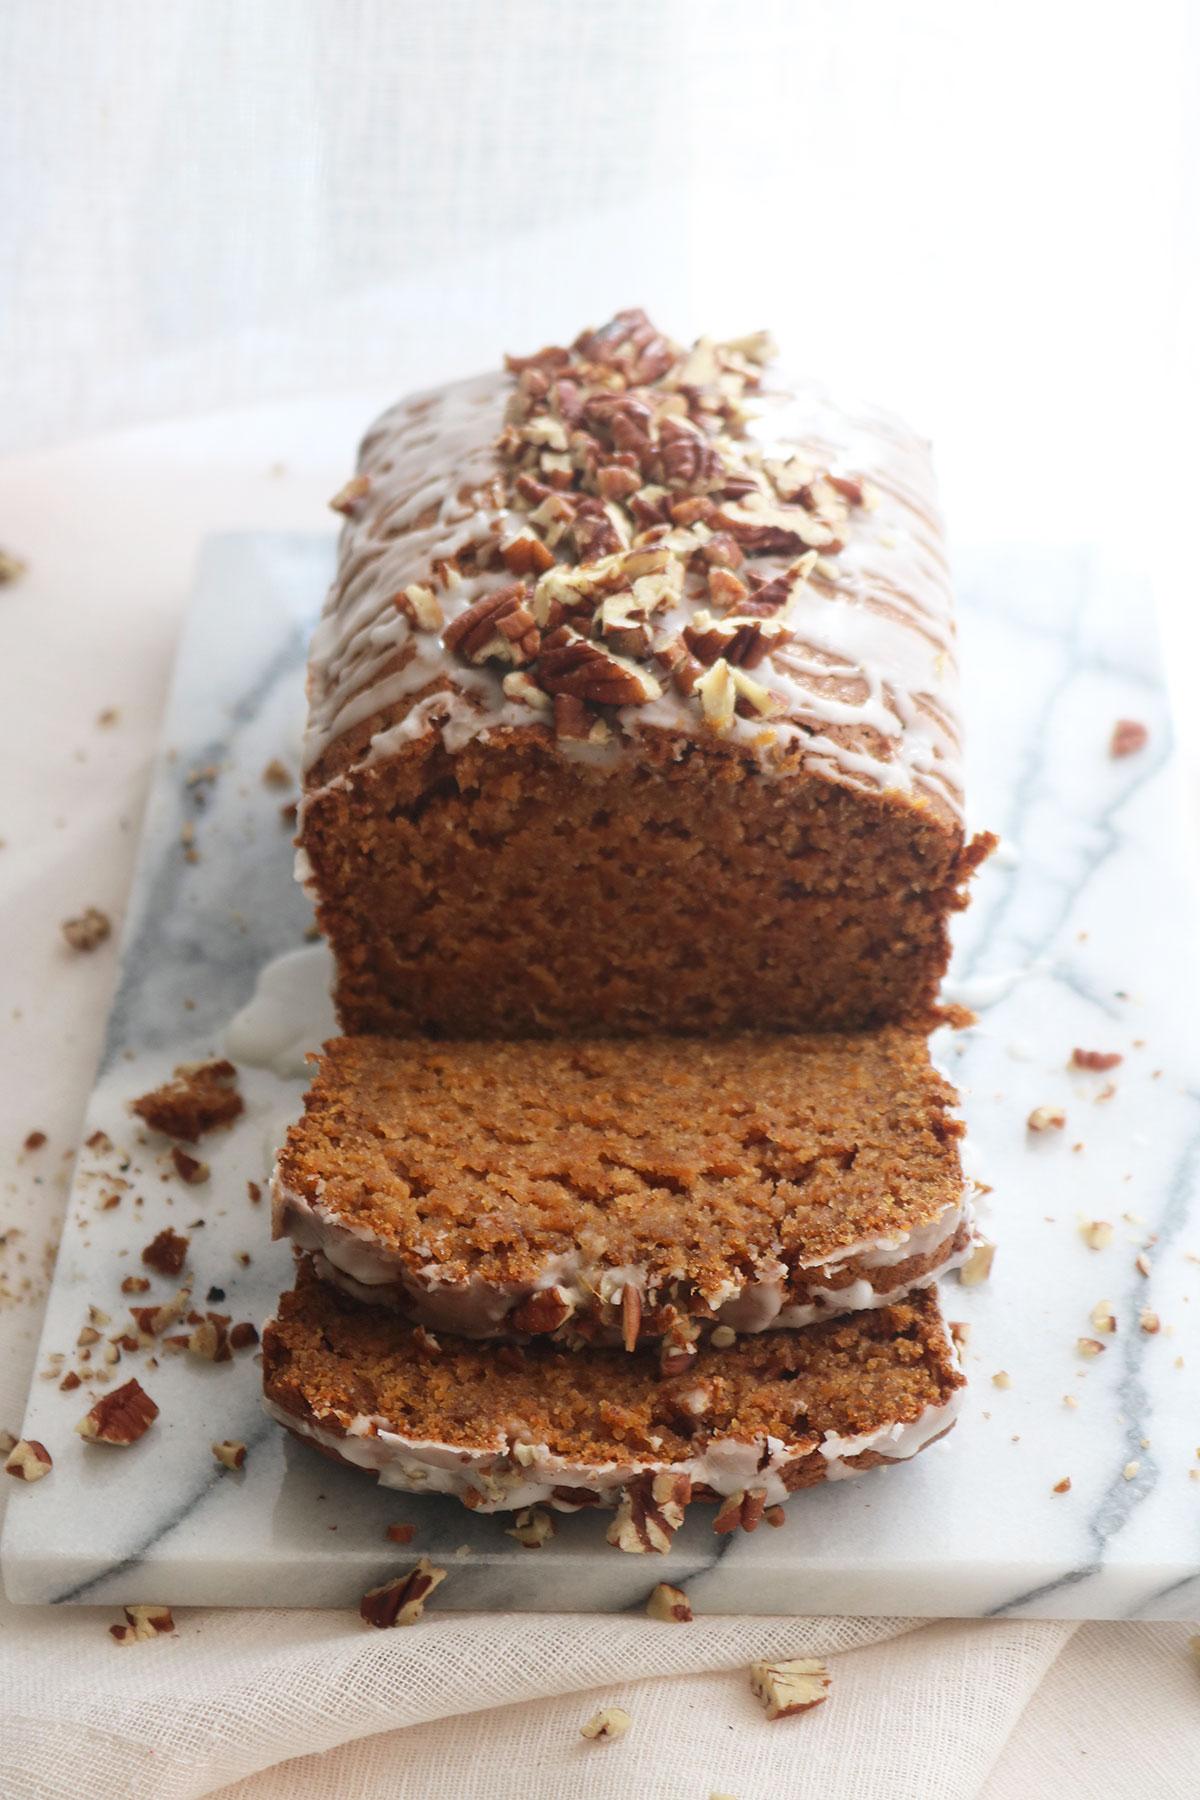 Spiced Sweet Potato Loaf with Vanilla Glaze